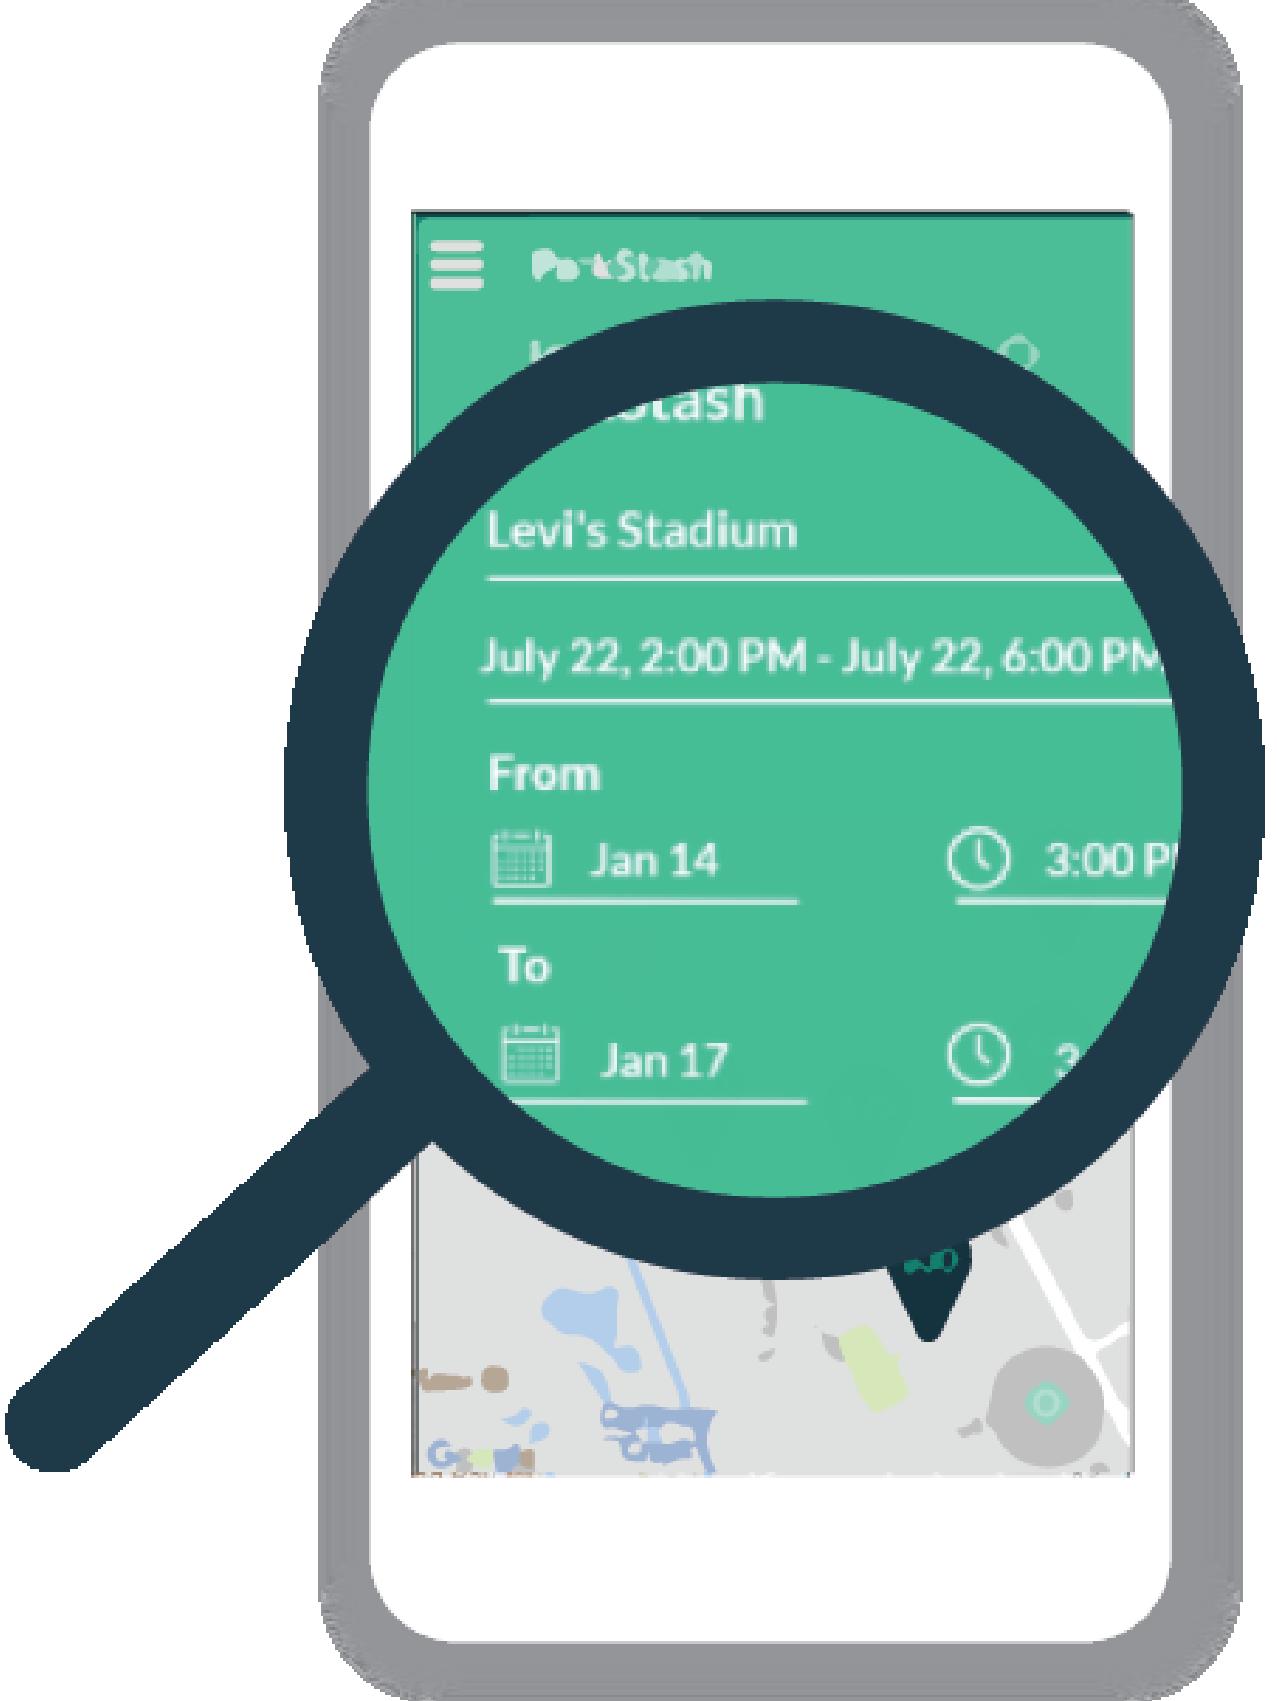 Search for parking spots on ParkStash app